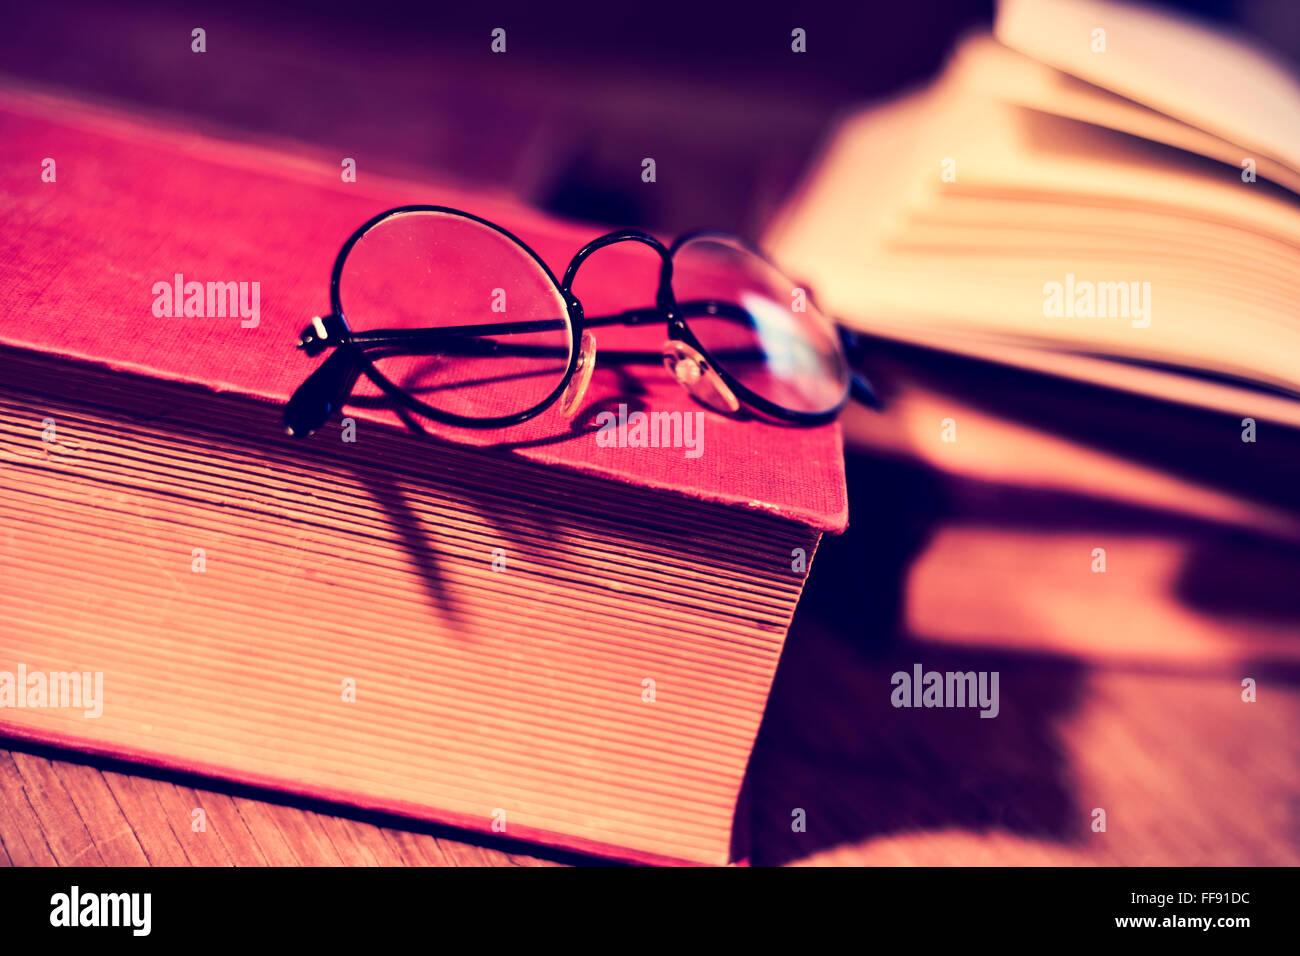 Non Filtered Stockfotos & Non Filtered Bilder - Alamy